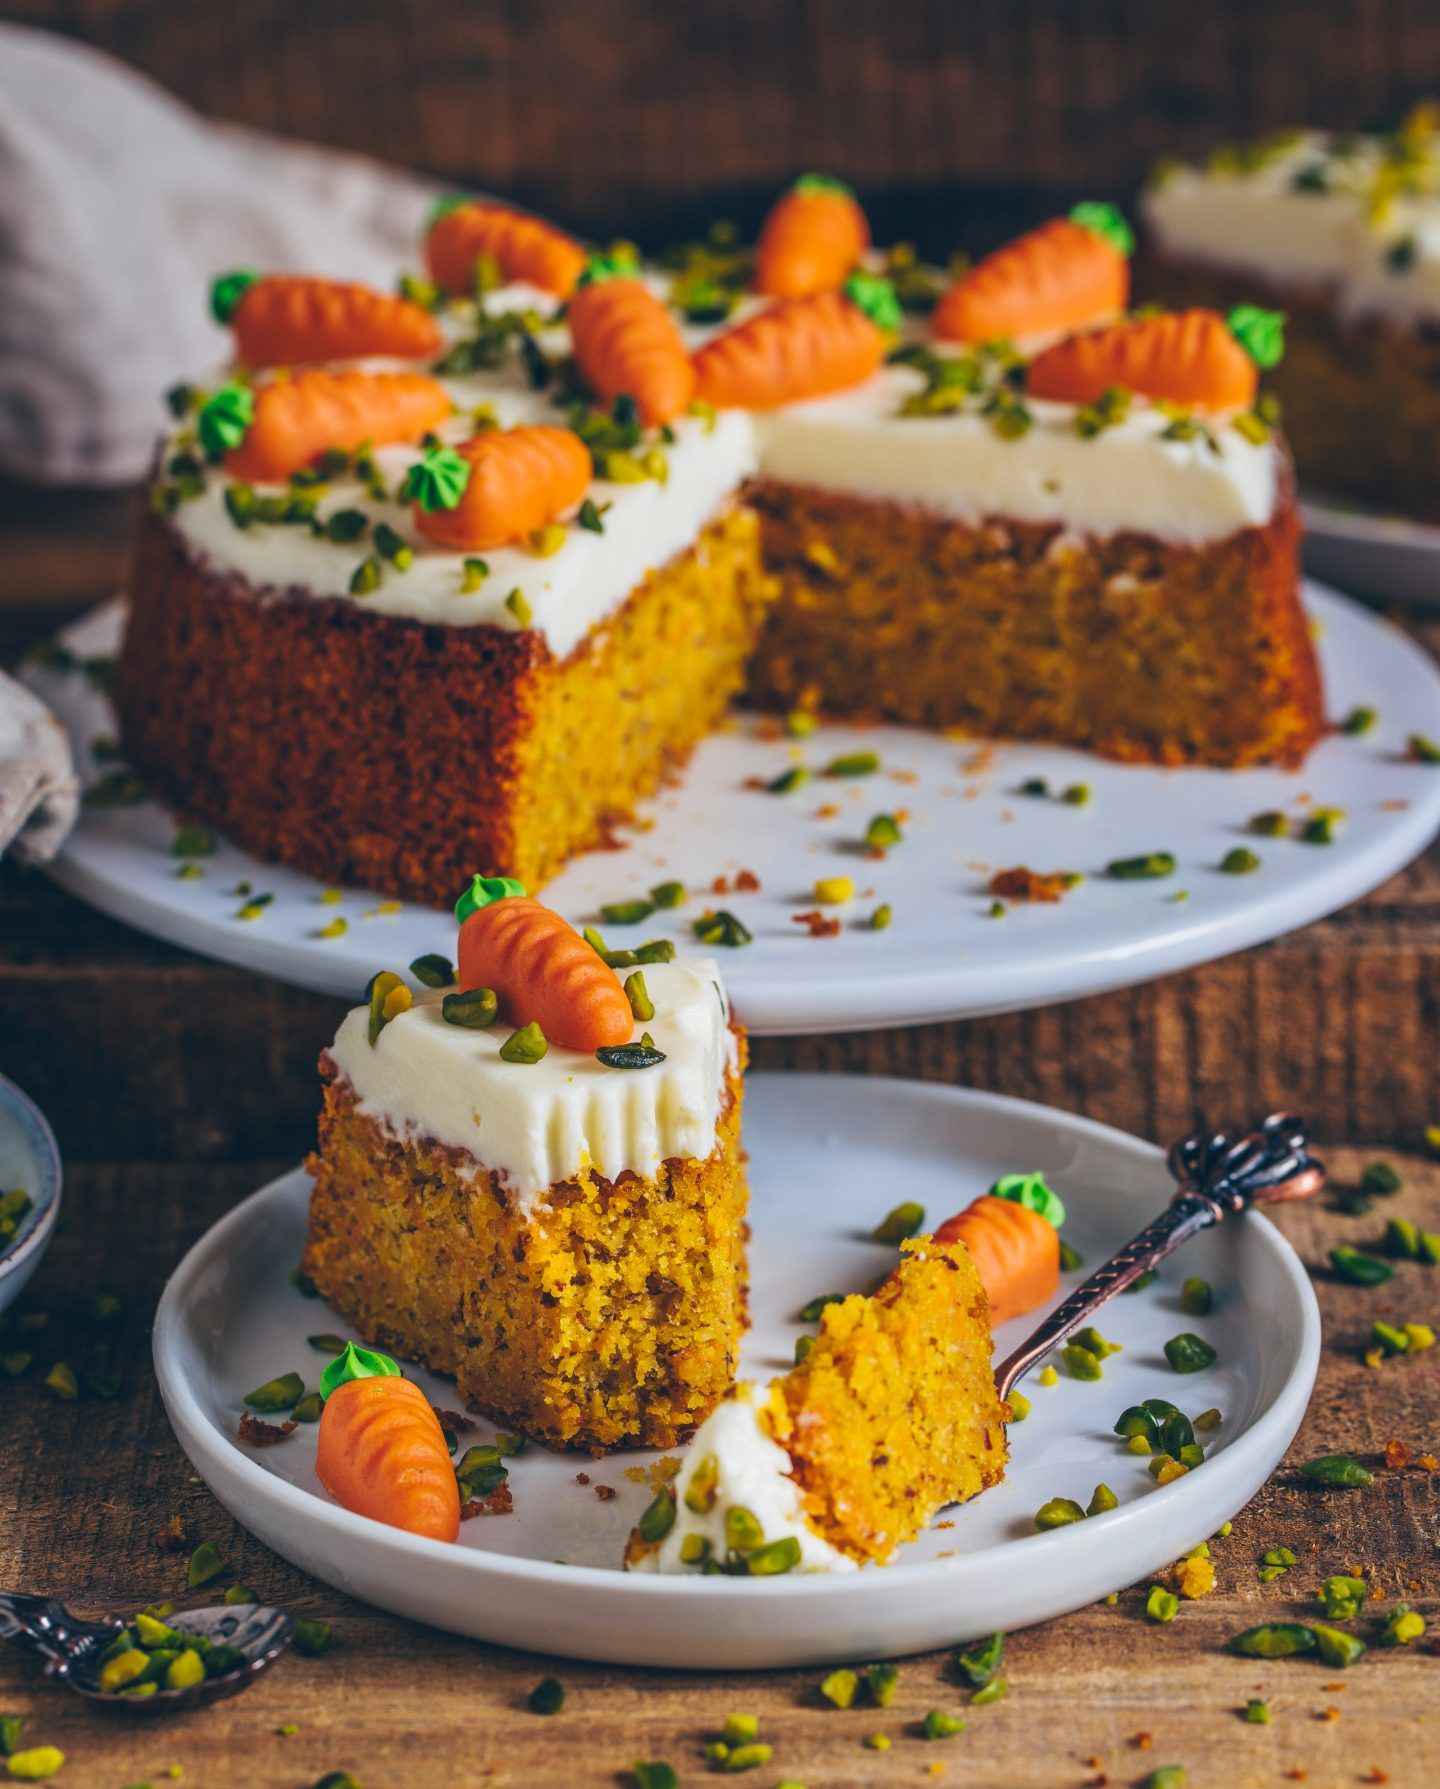 Karottenkuchen (Möhrenkuchen, vegan #easysimpledesserts